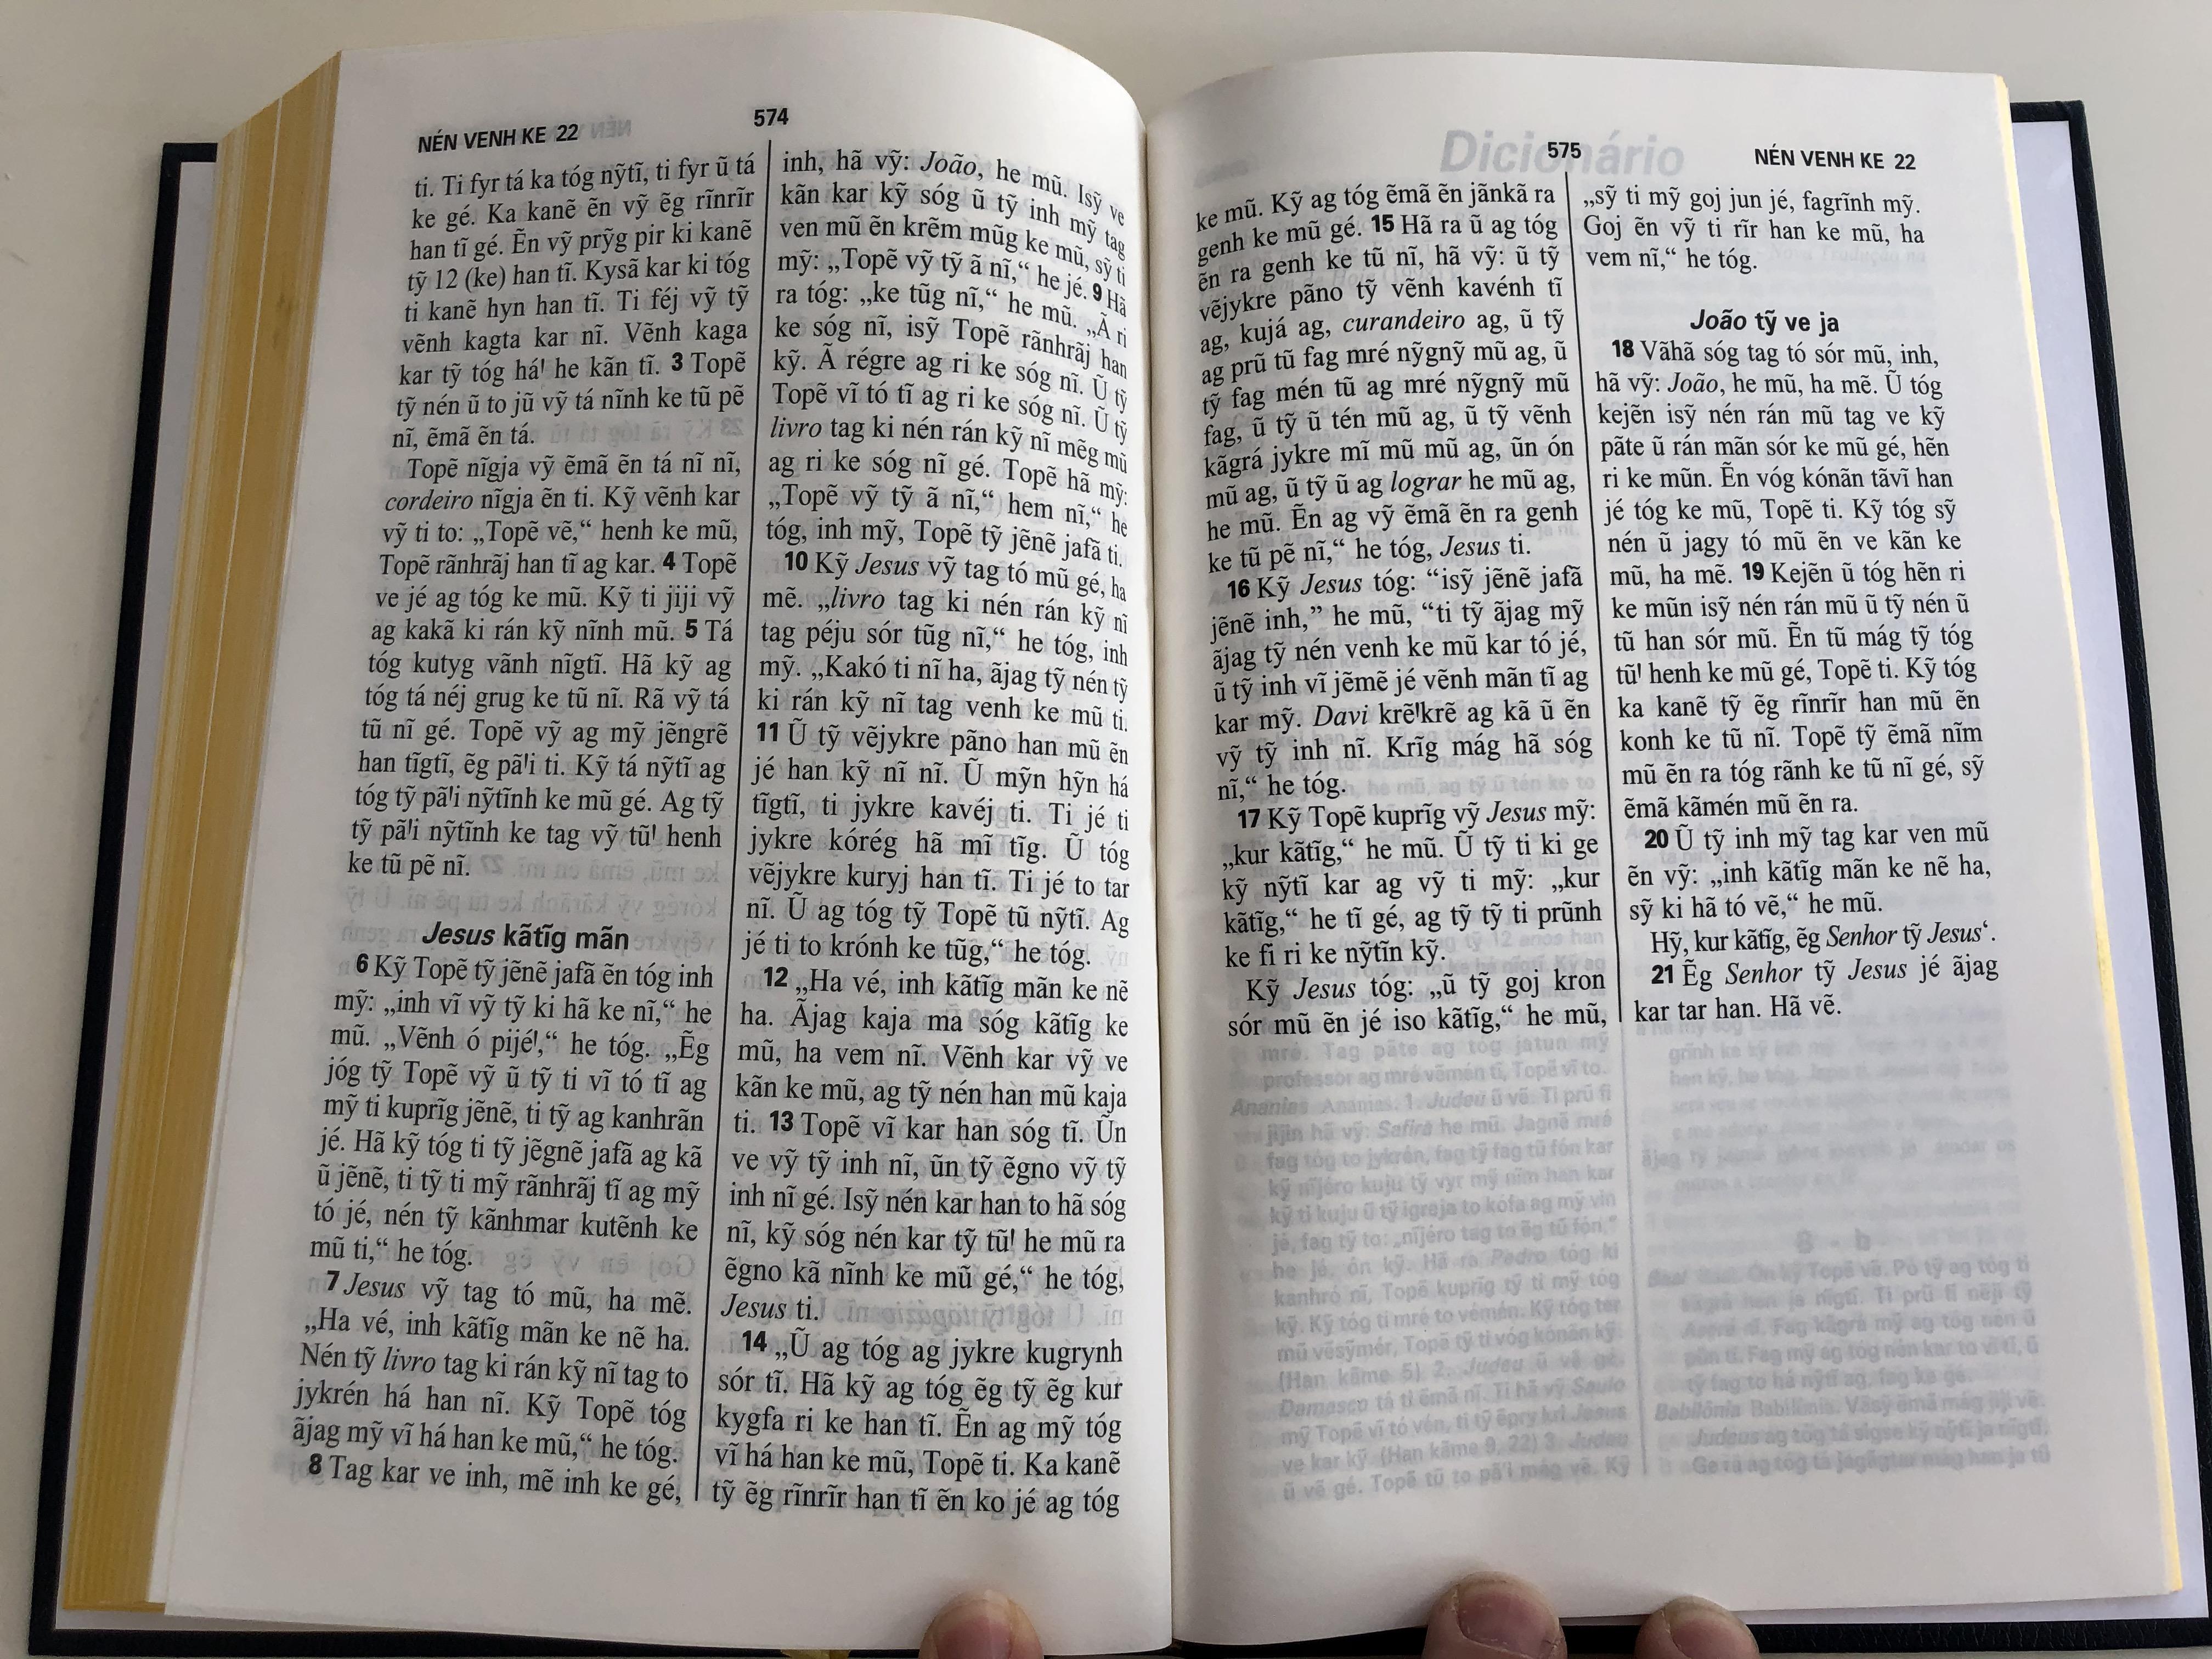 top-v-r-o-novo-testamento-the-new-testament-in-kaingang-language-bible-society-brasil-2005-hardcover-2nd-edition-11-.jpg